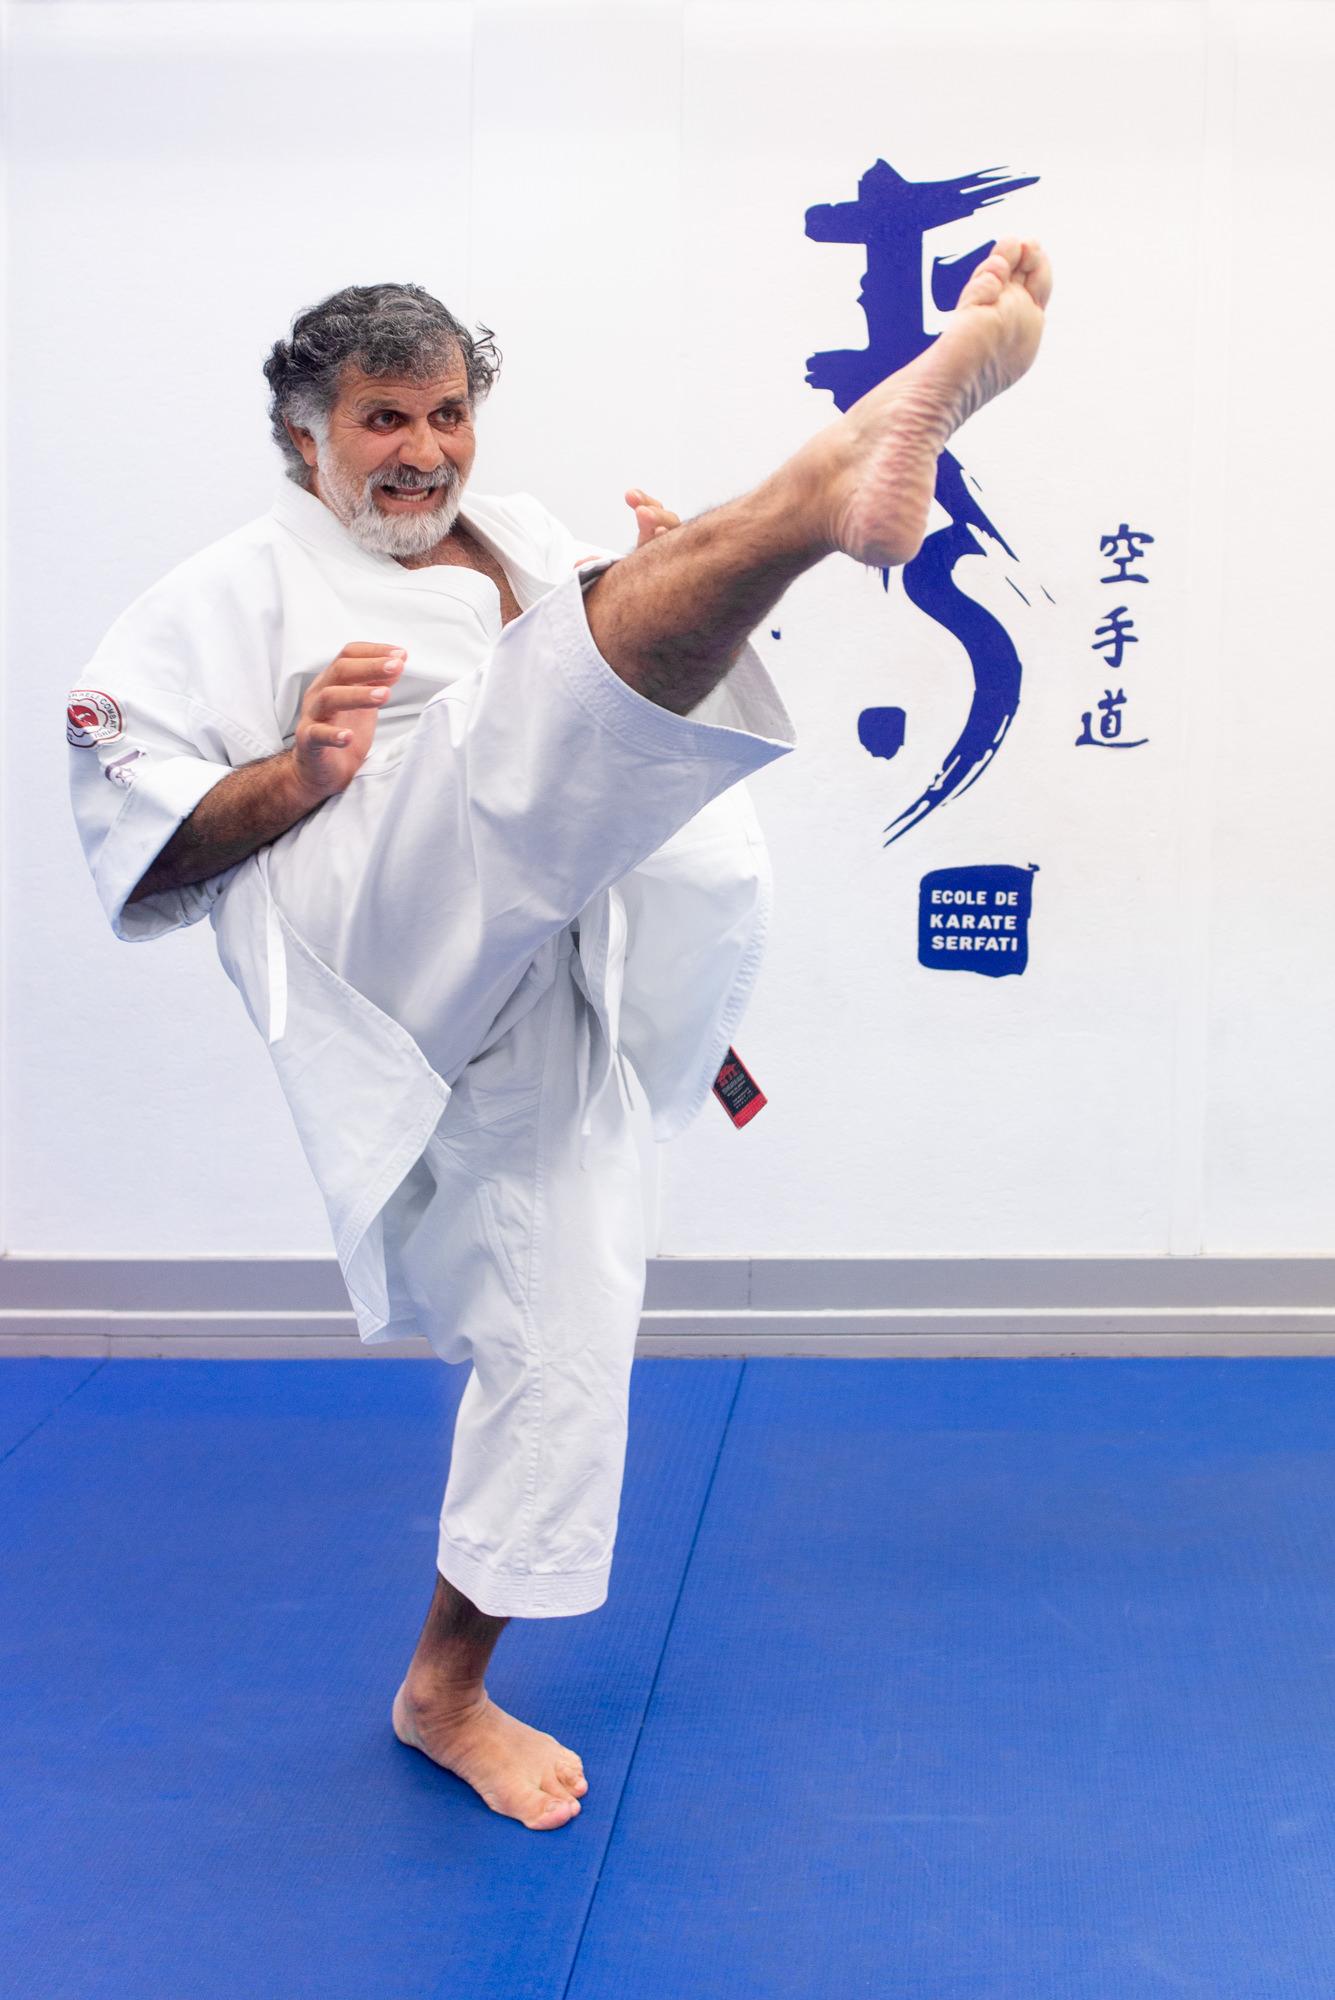 Jacques Serfati Shogun Center Karaté